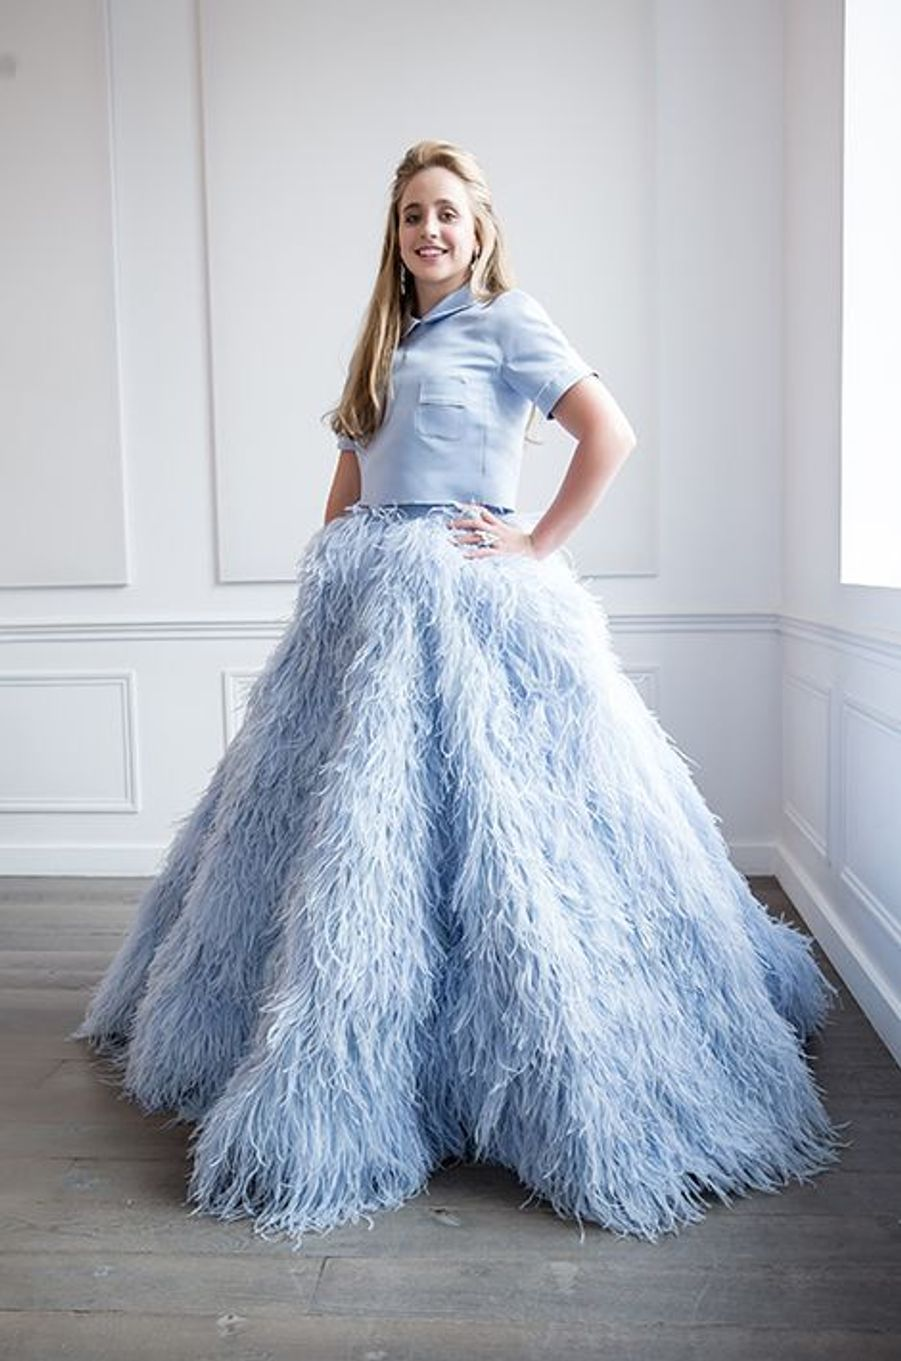 Olivia Hallisey (USA) en robe Giambattista Valli Haute-Couture, bijoux Payal New York